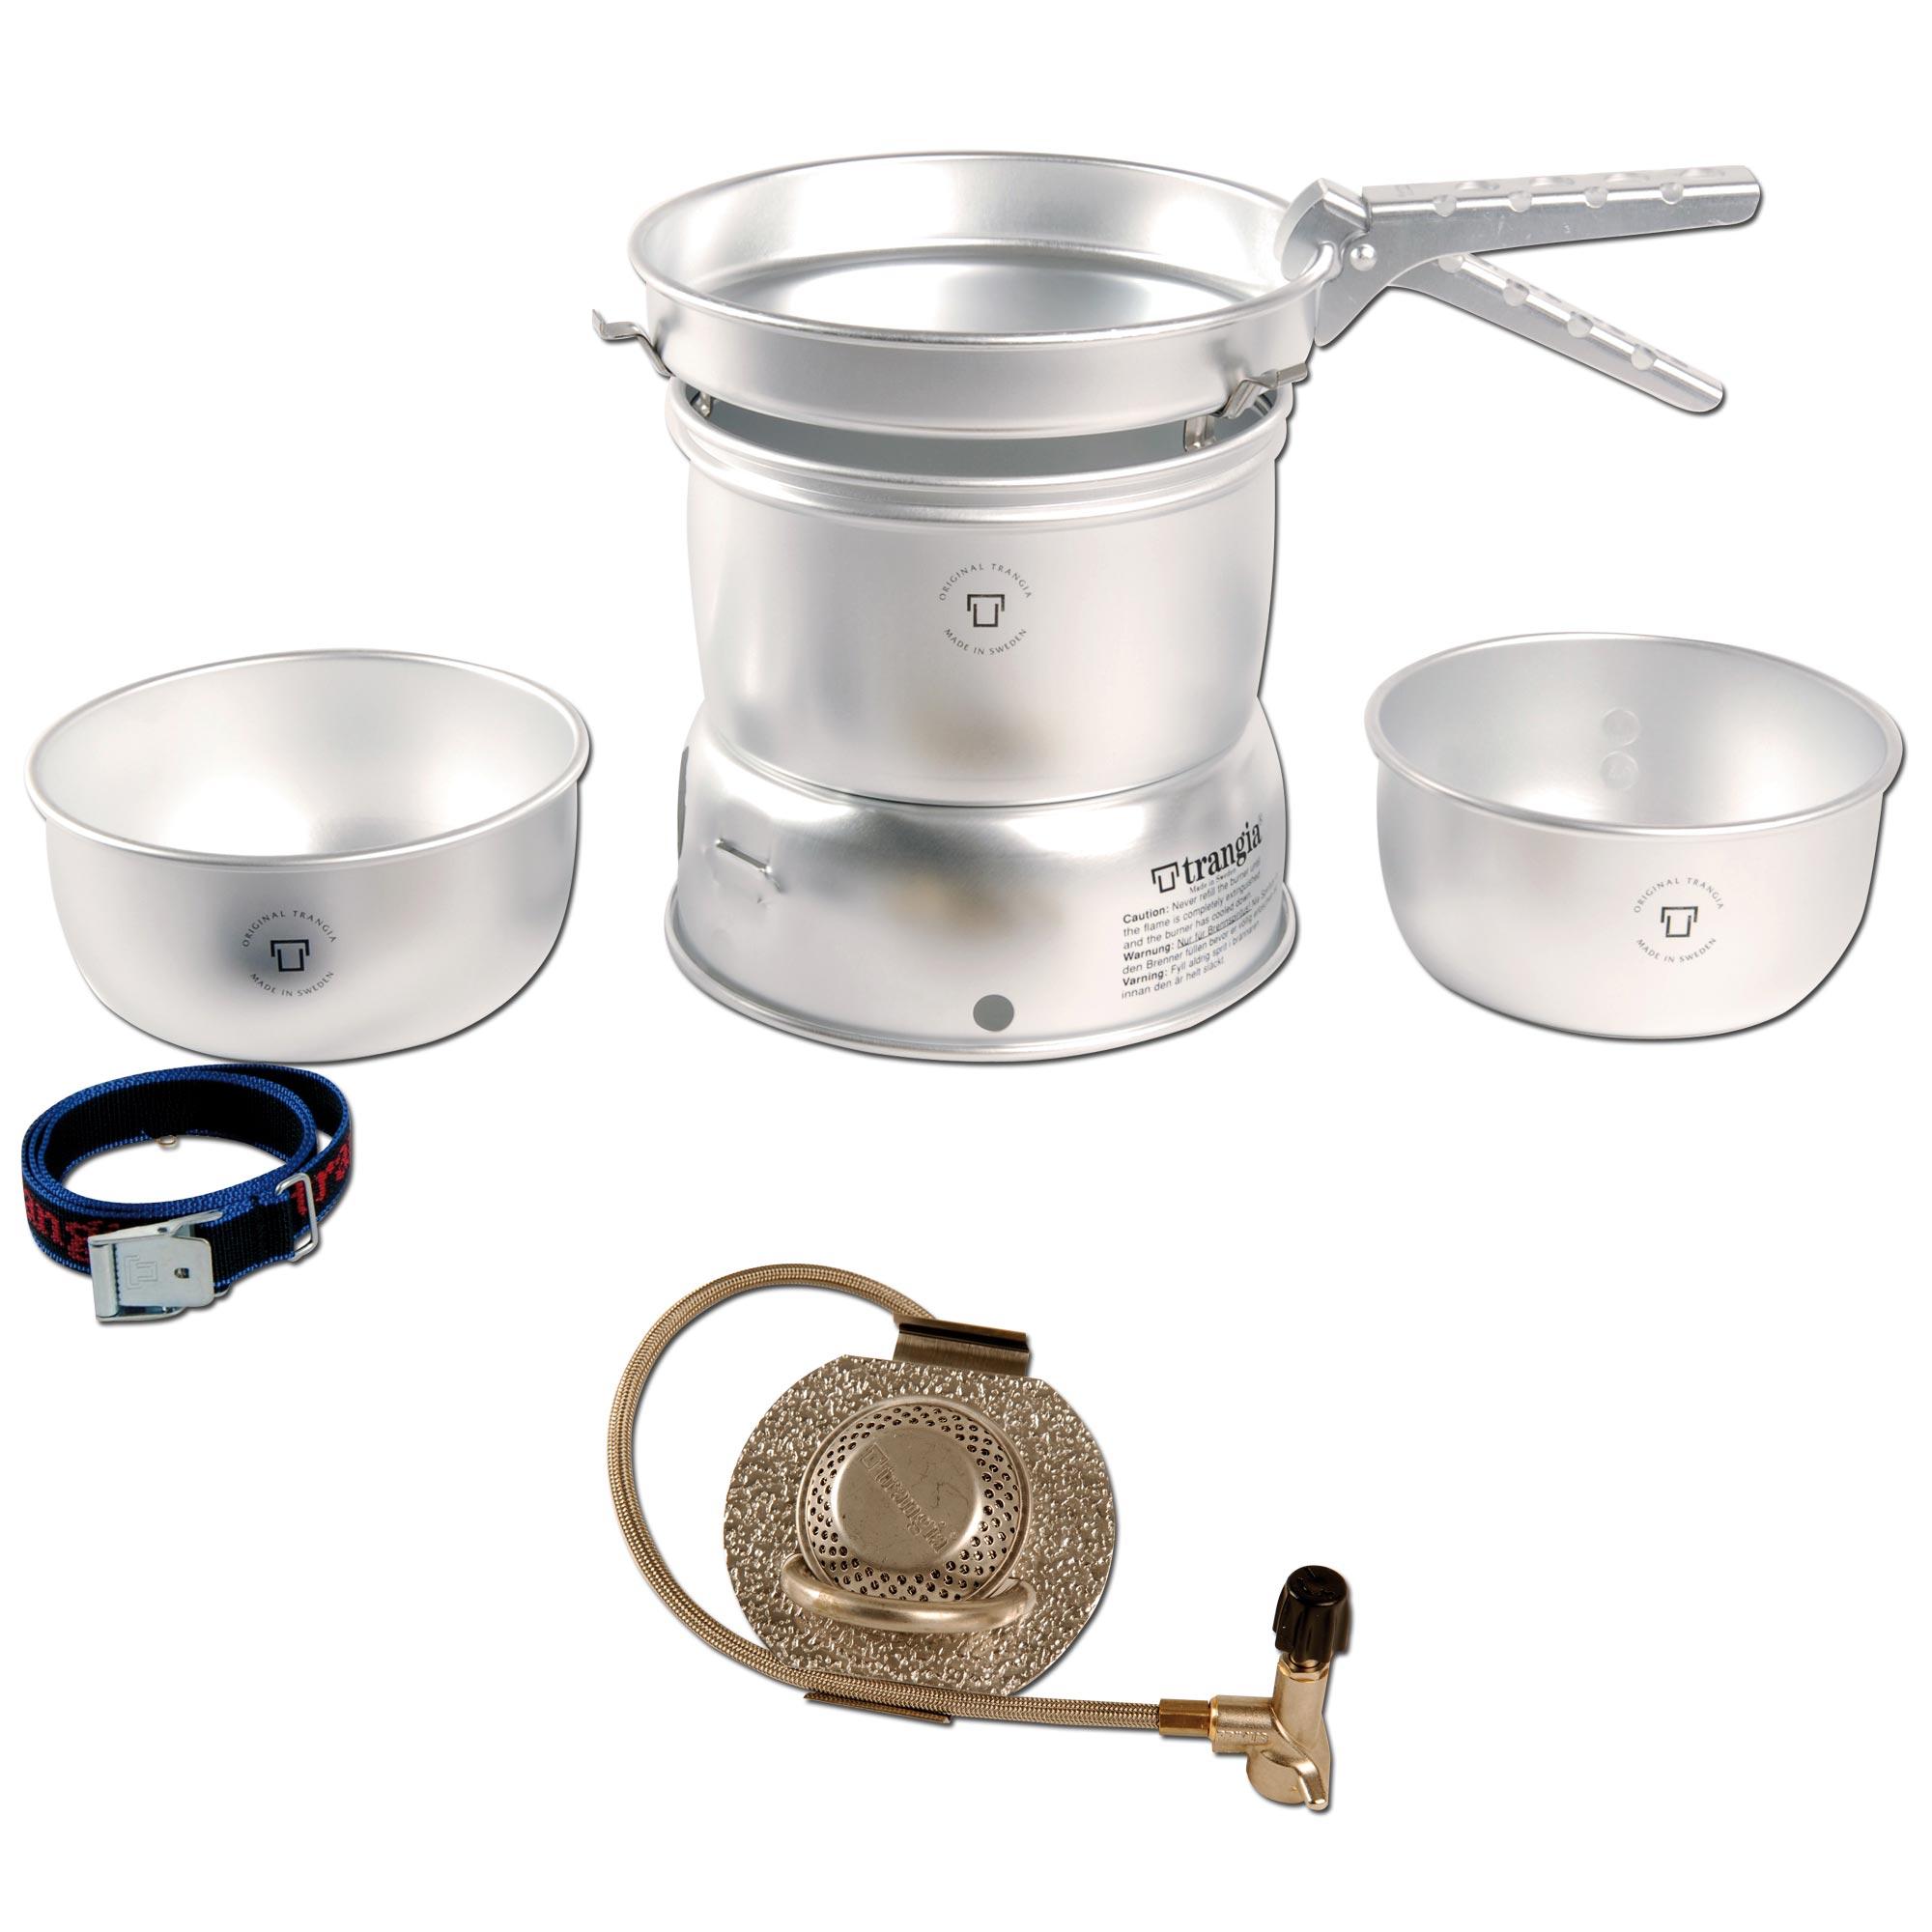 Cooker Trangia 27-1 UL (Gas)